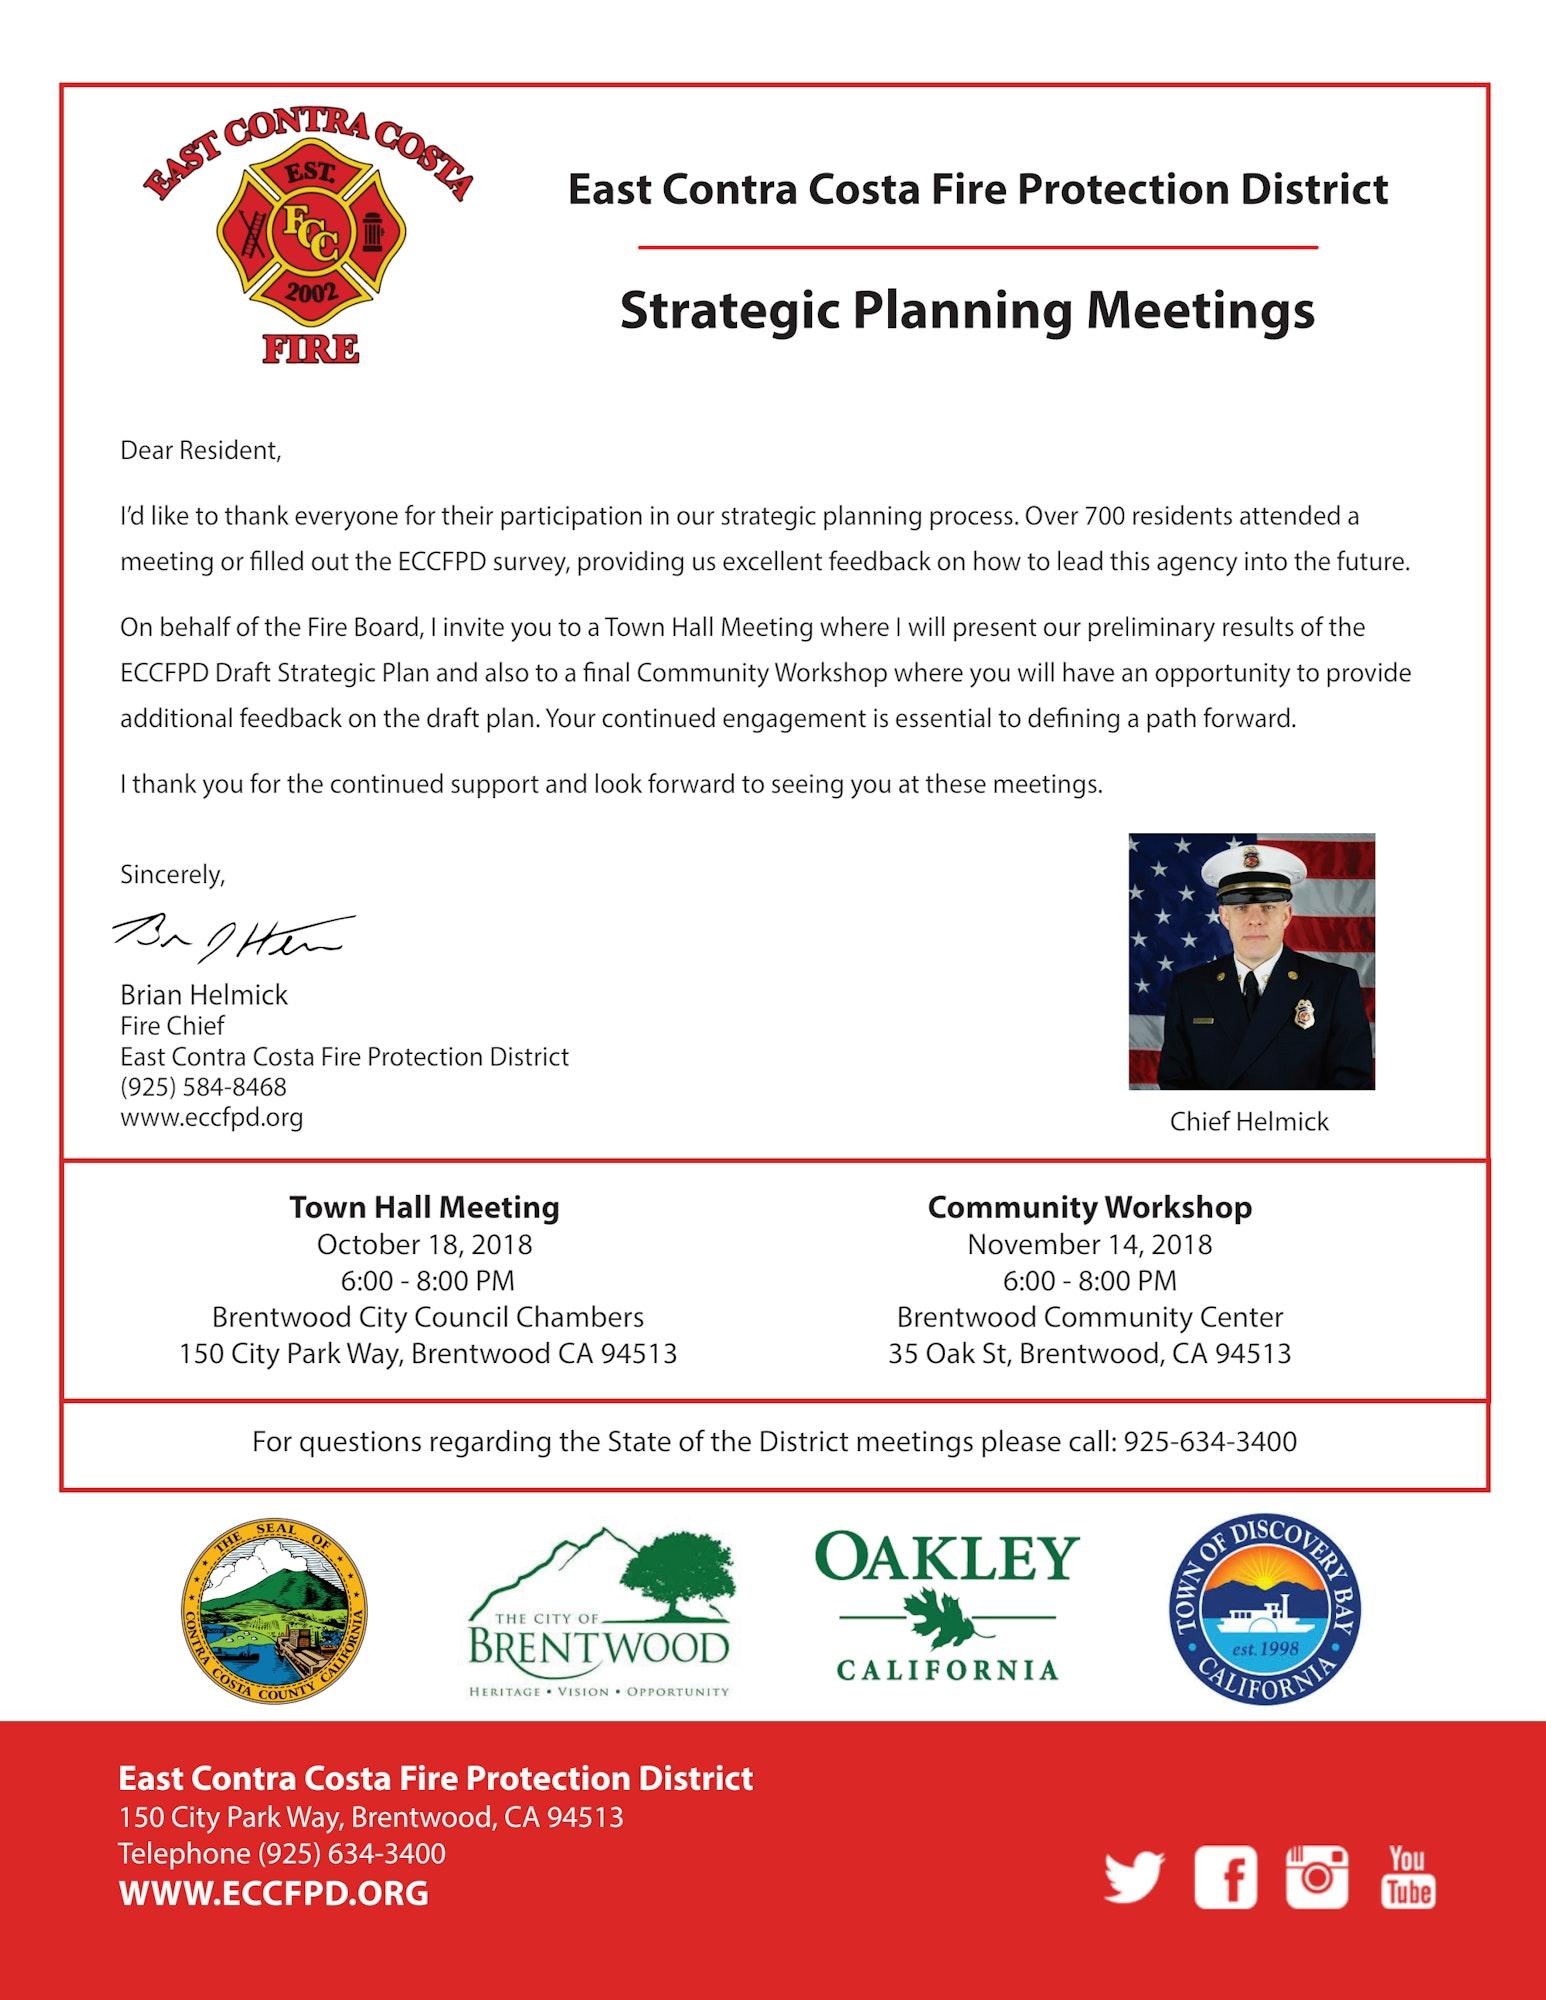 ECCFPD Strategic Planning - East Contra Costa Fire